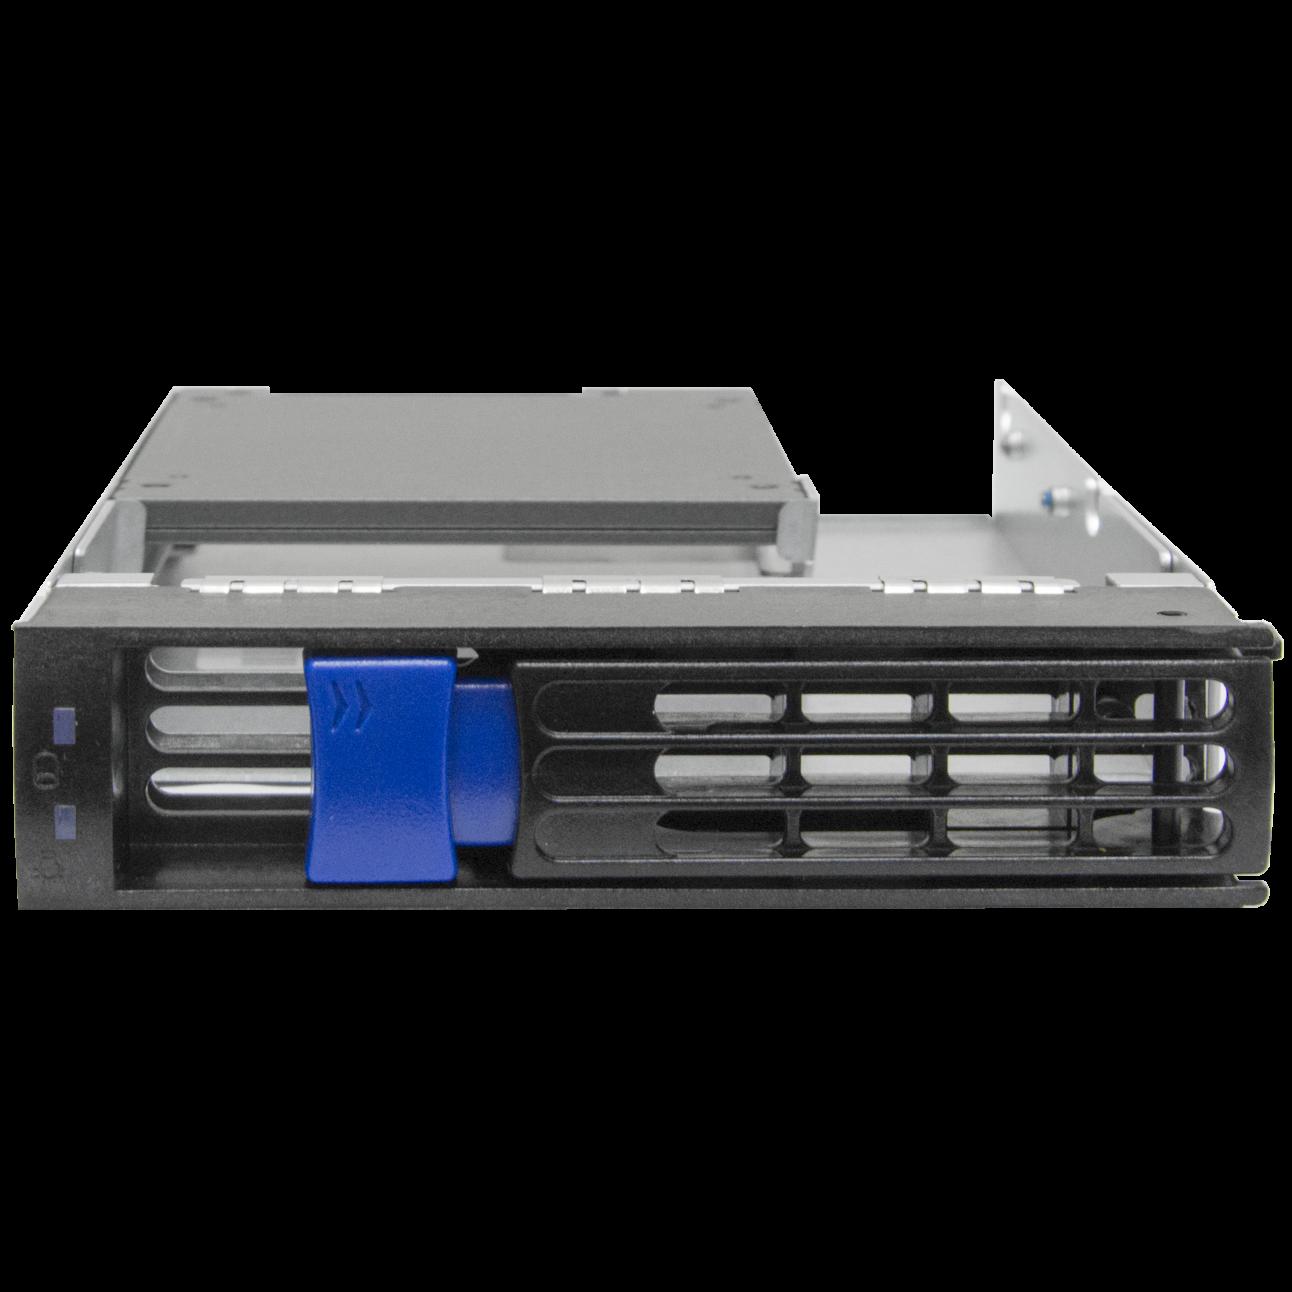 Сервер SNR-SR160, 1U, 1 процессор Intel Xeon E3-1220v3, 16G DDR3, 2x1TB HDD, фиксированный БП